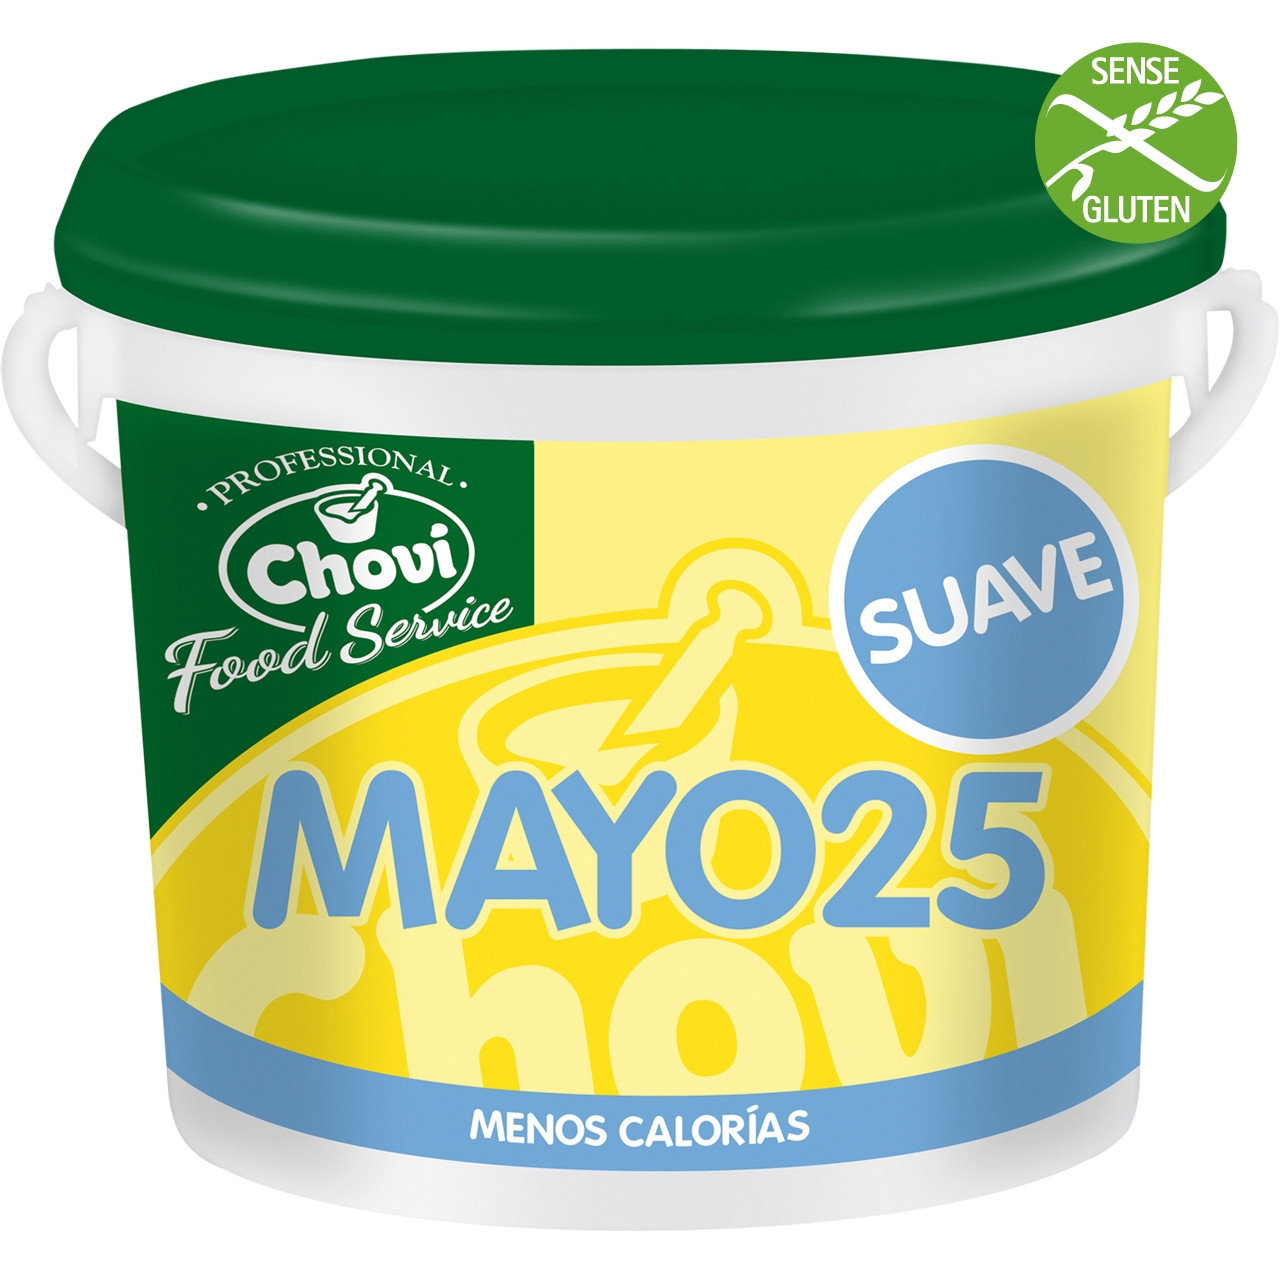 Mayo25 salsa fina Chovi